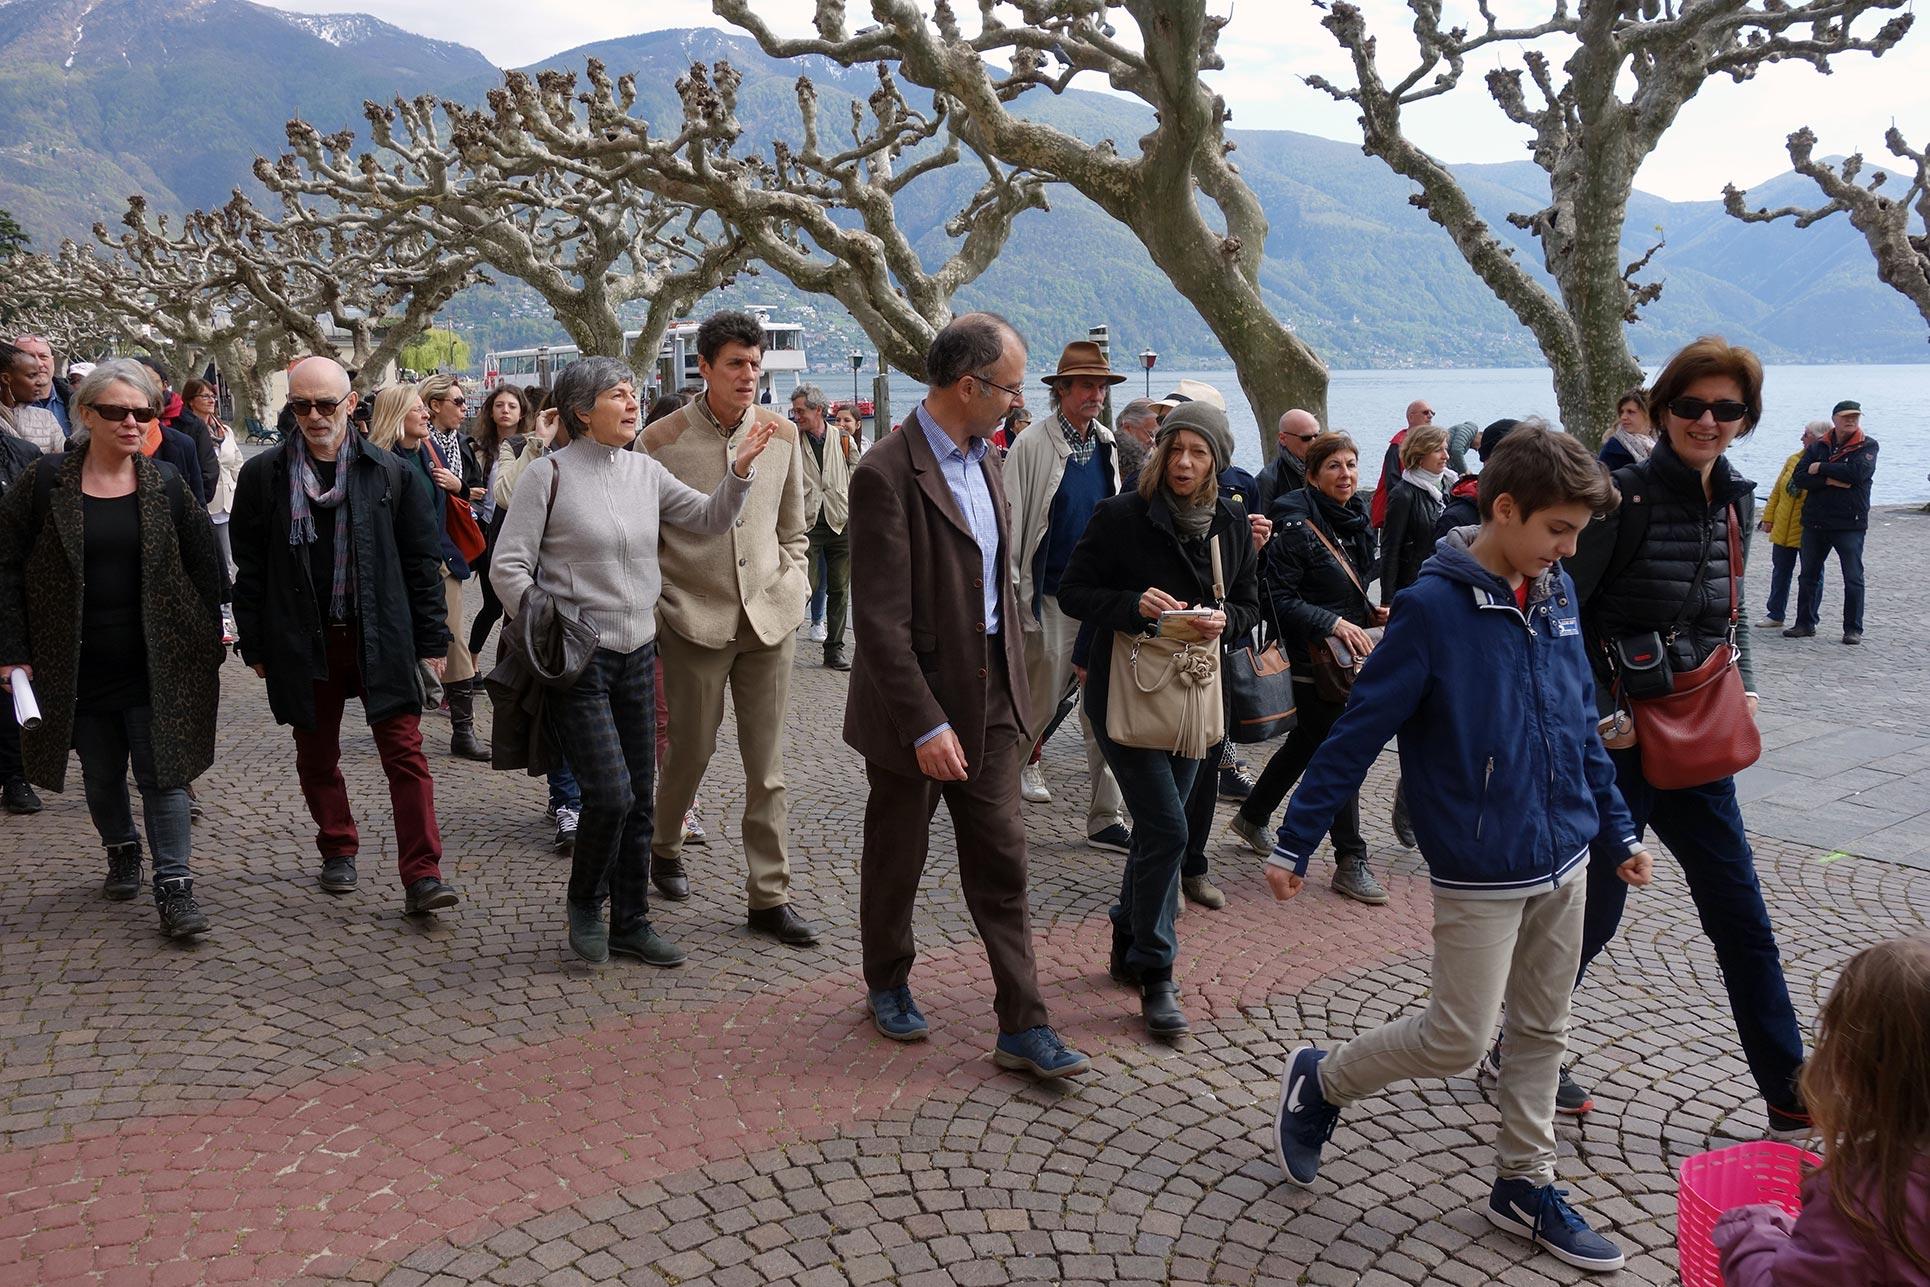 Arrived in Ascona